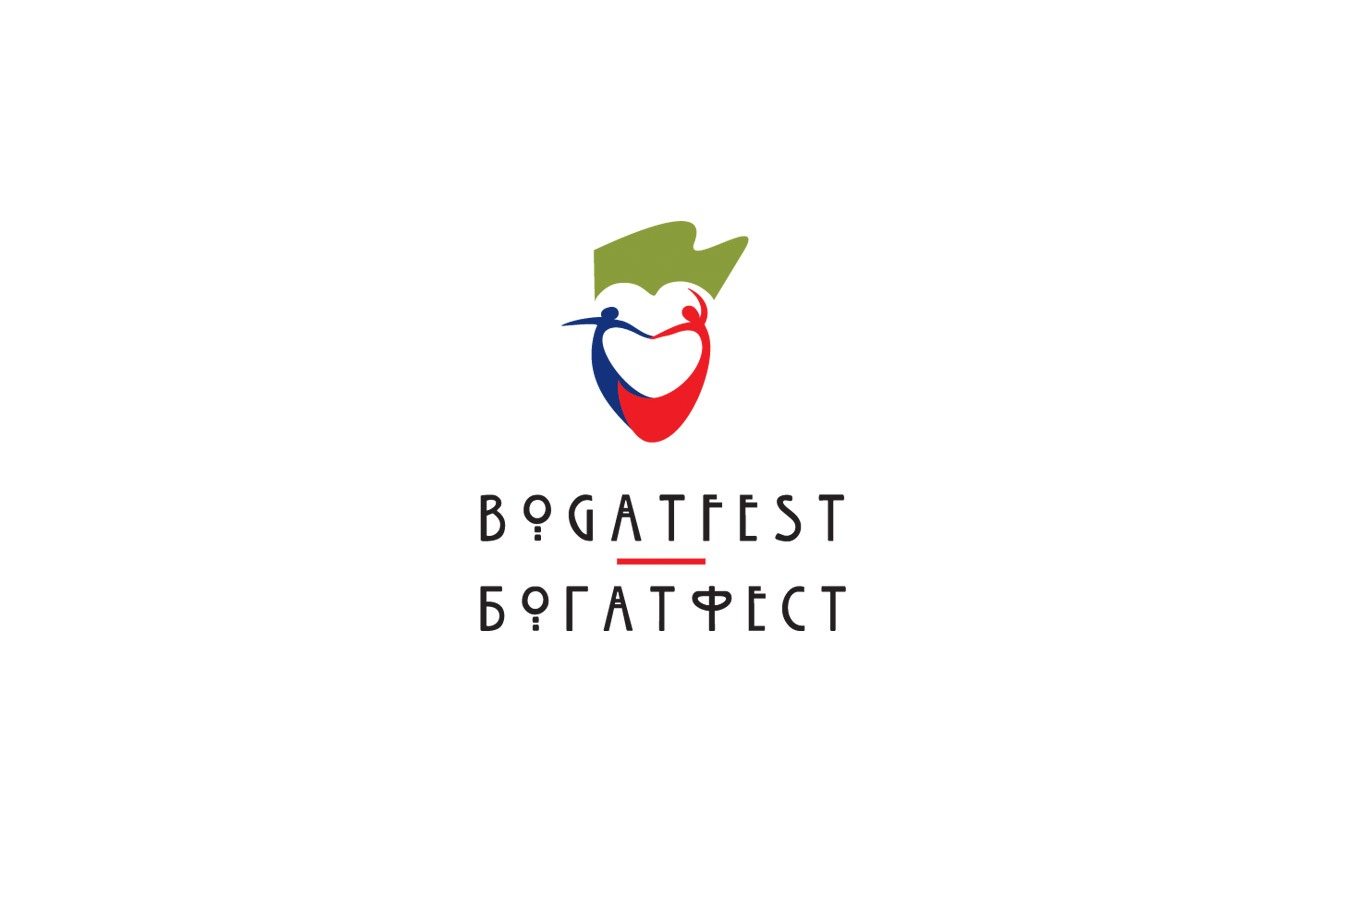 Izrada logotipa za medjunarodni festival Bogatfest iz Bogatica